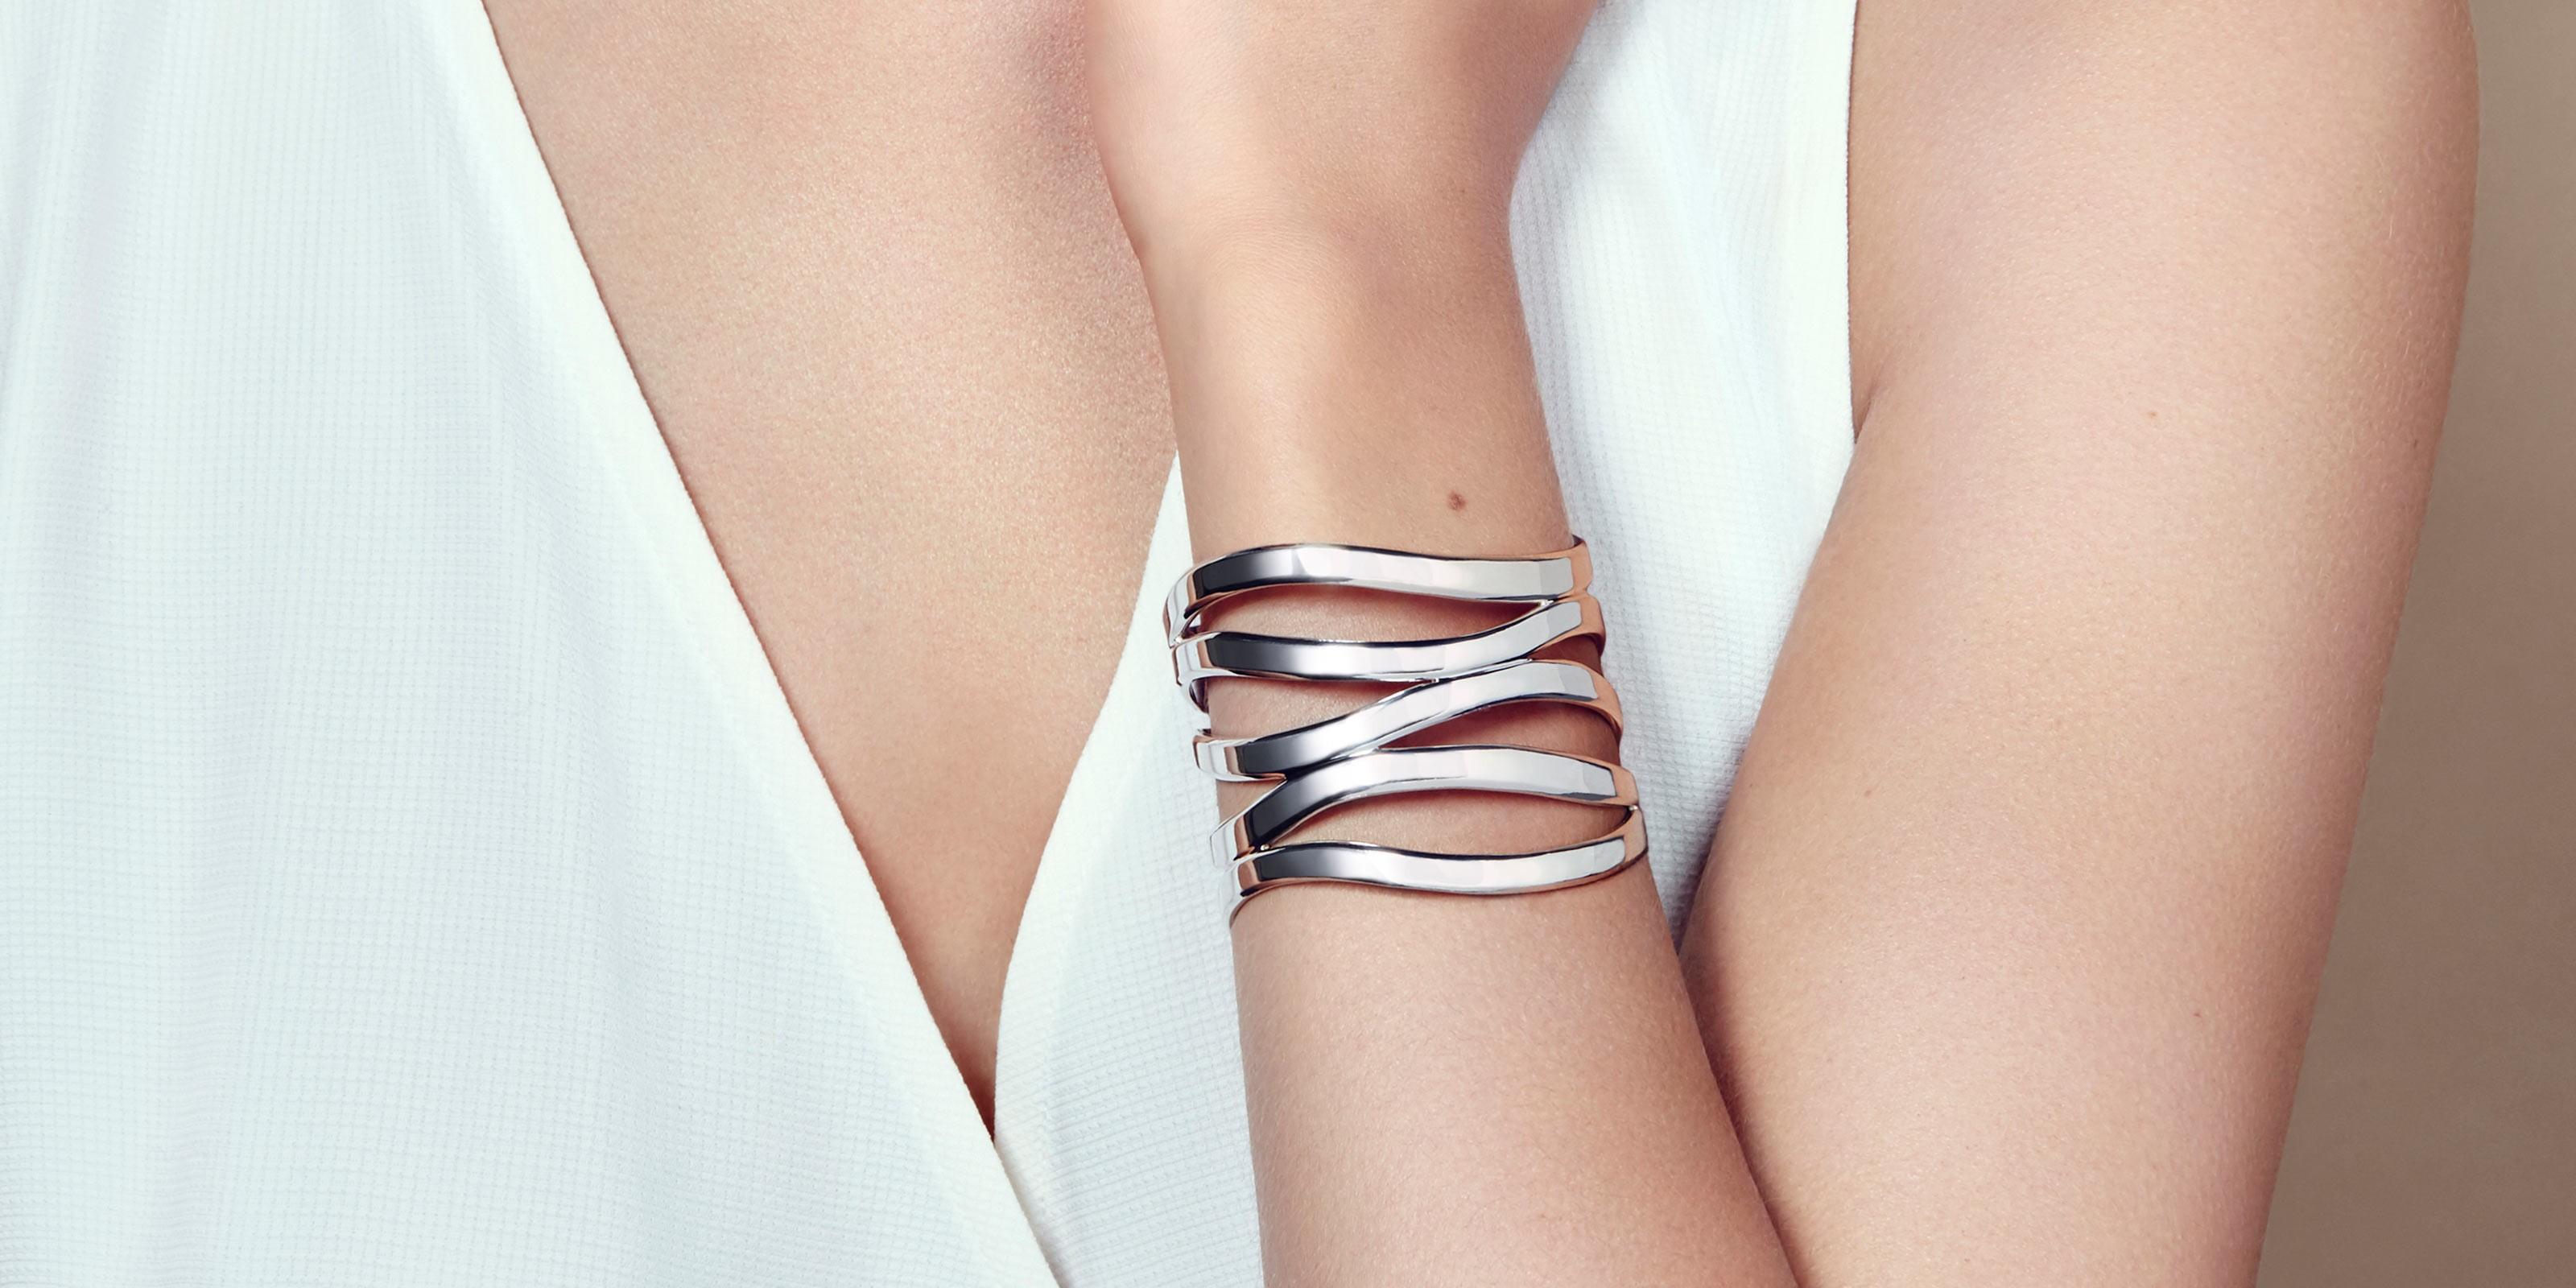 cc5e5c8440b4 The bracelet measures 2 1 2